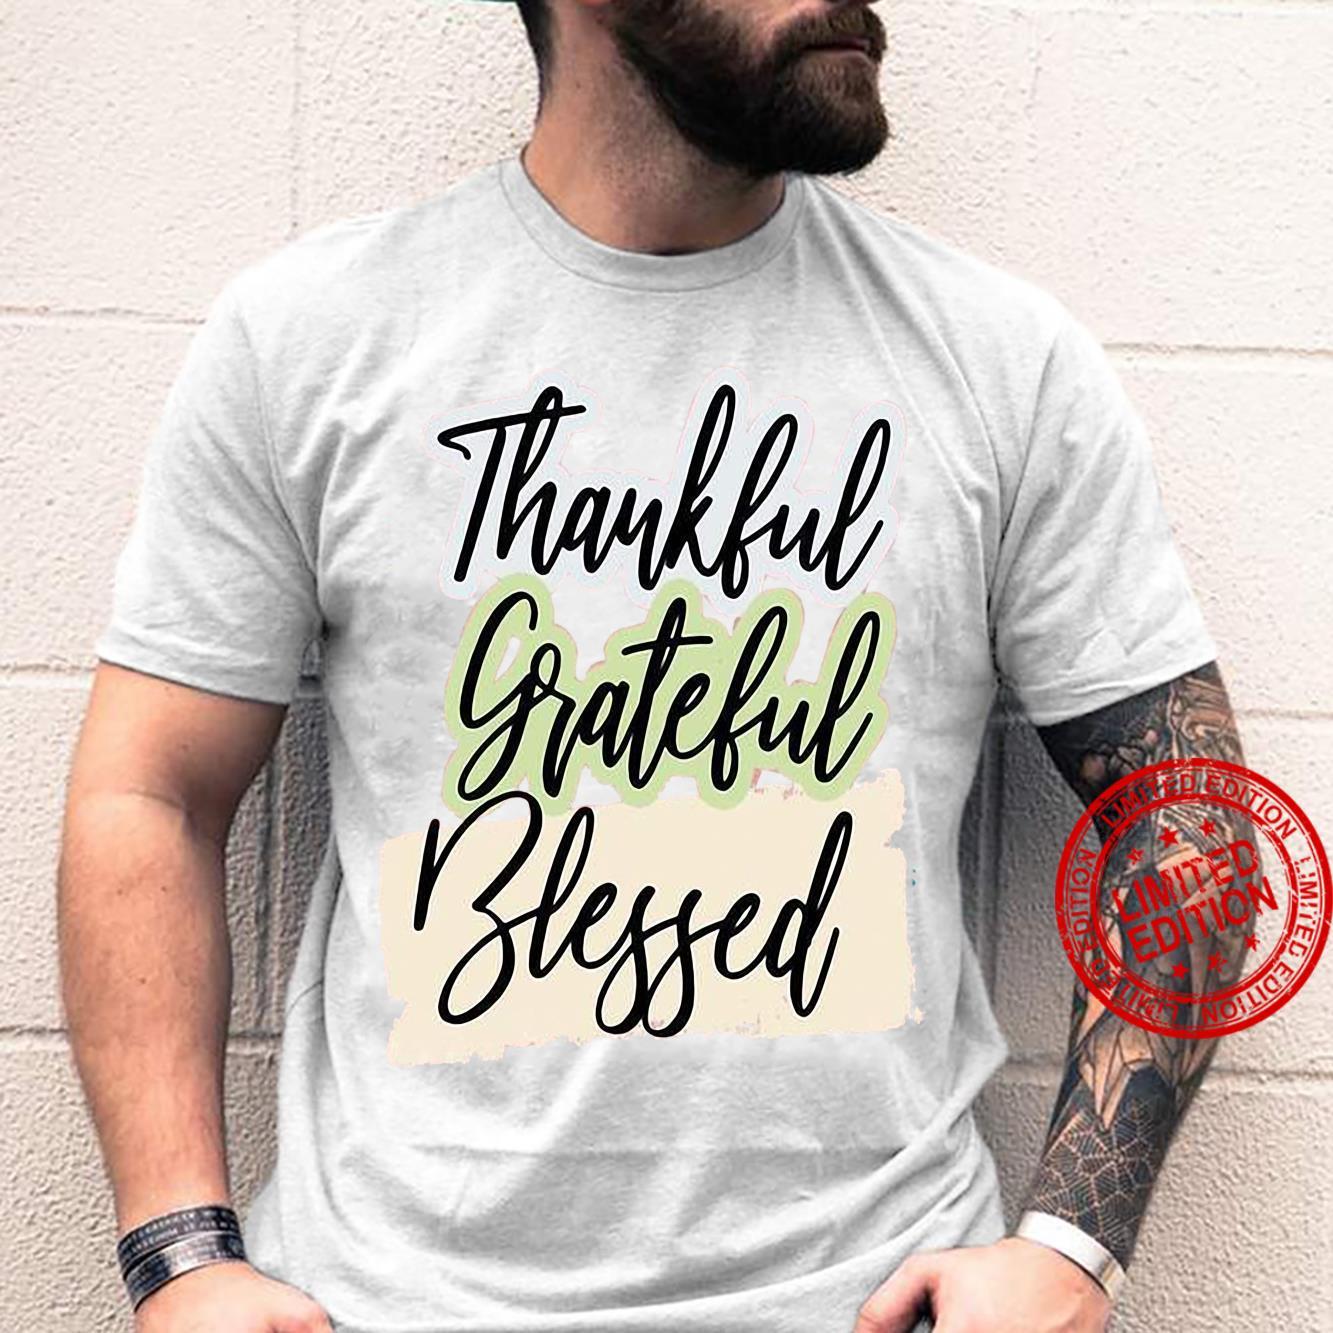 Thankful grateful blessed shirt